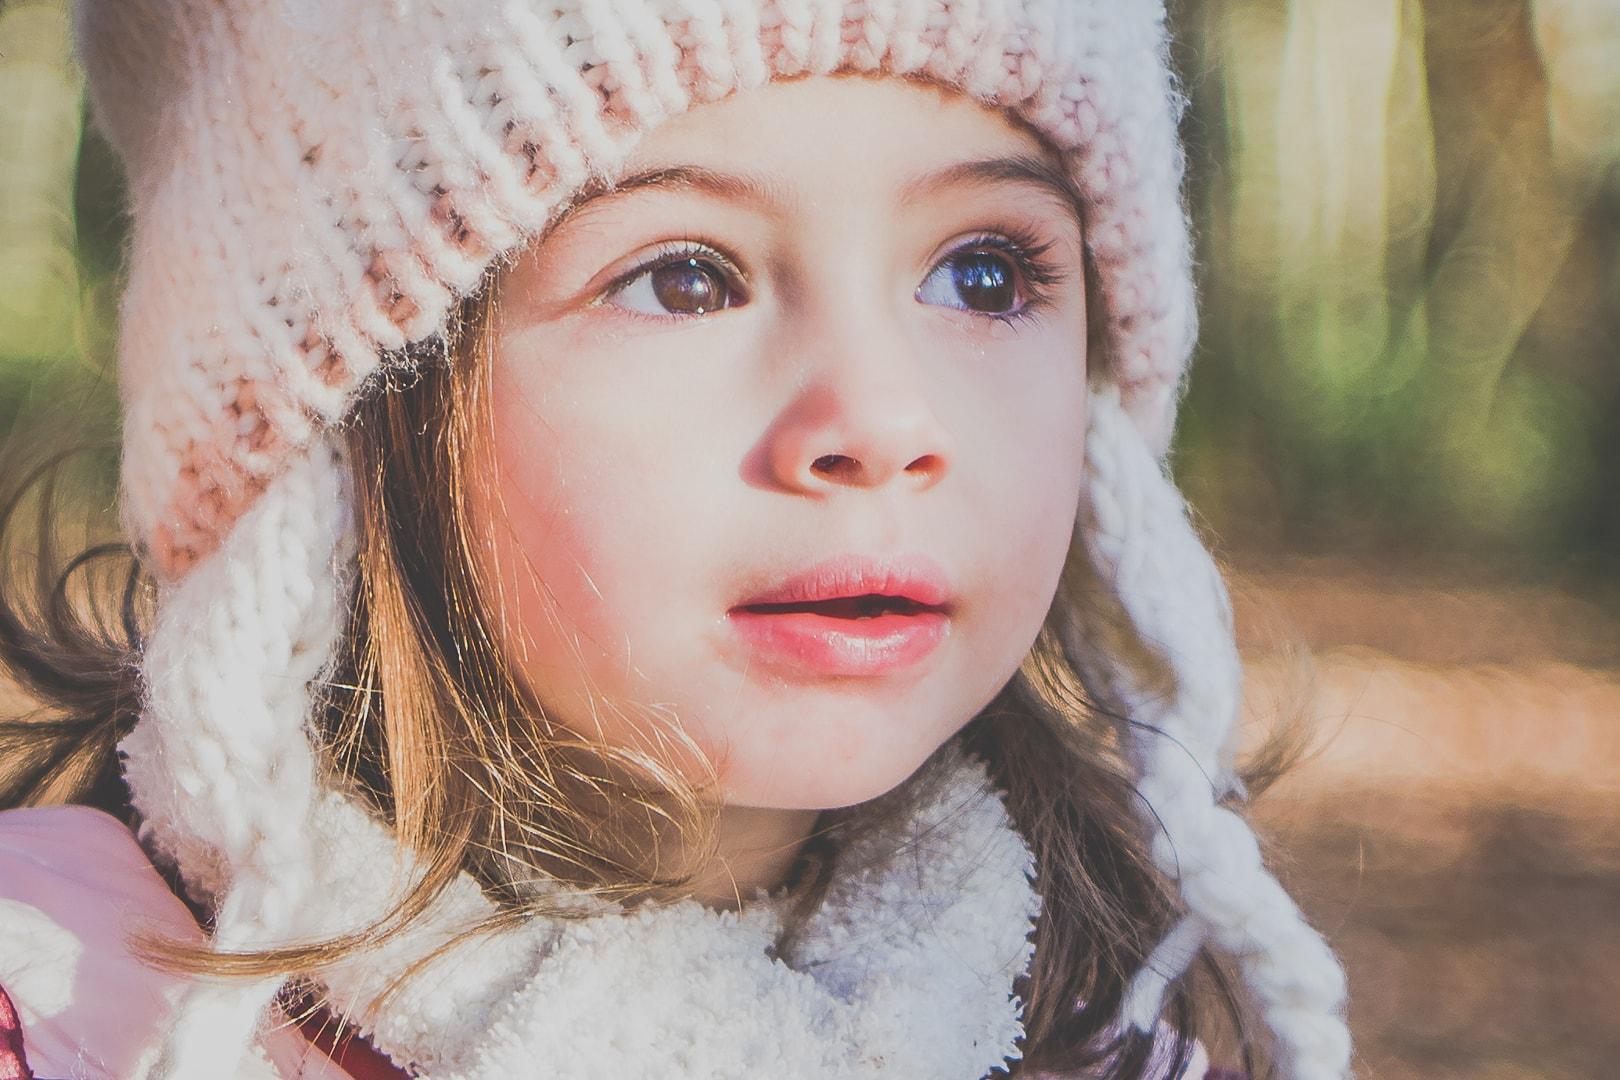 trezors-photography-photographe-professionnel-toulouse-31-enfance-seance-famille-lifestyle (22)